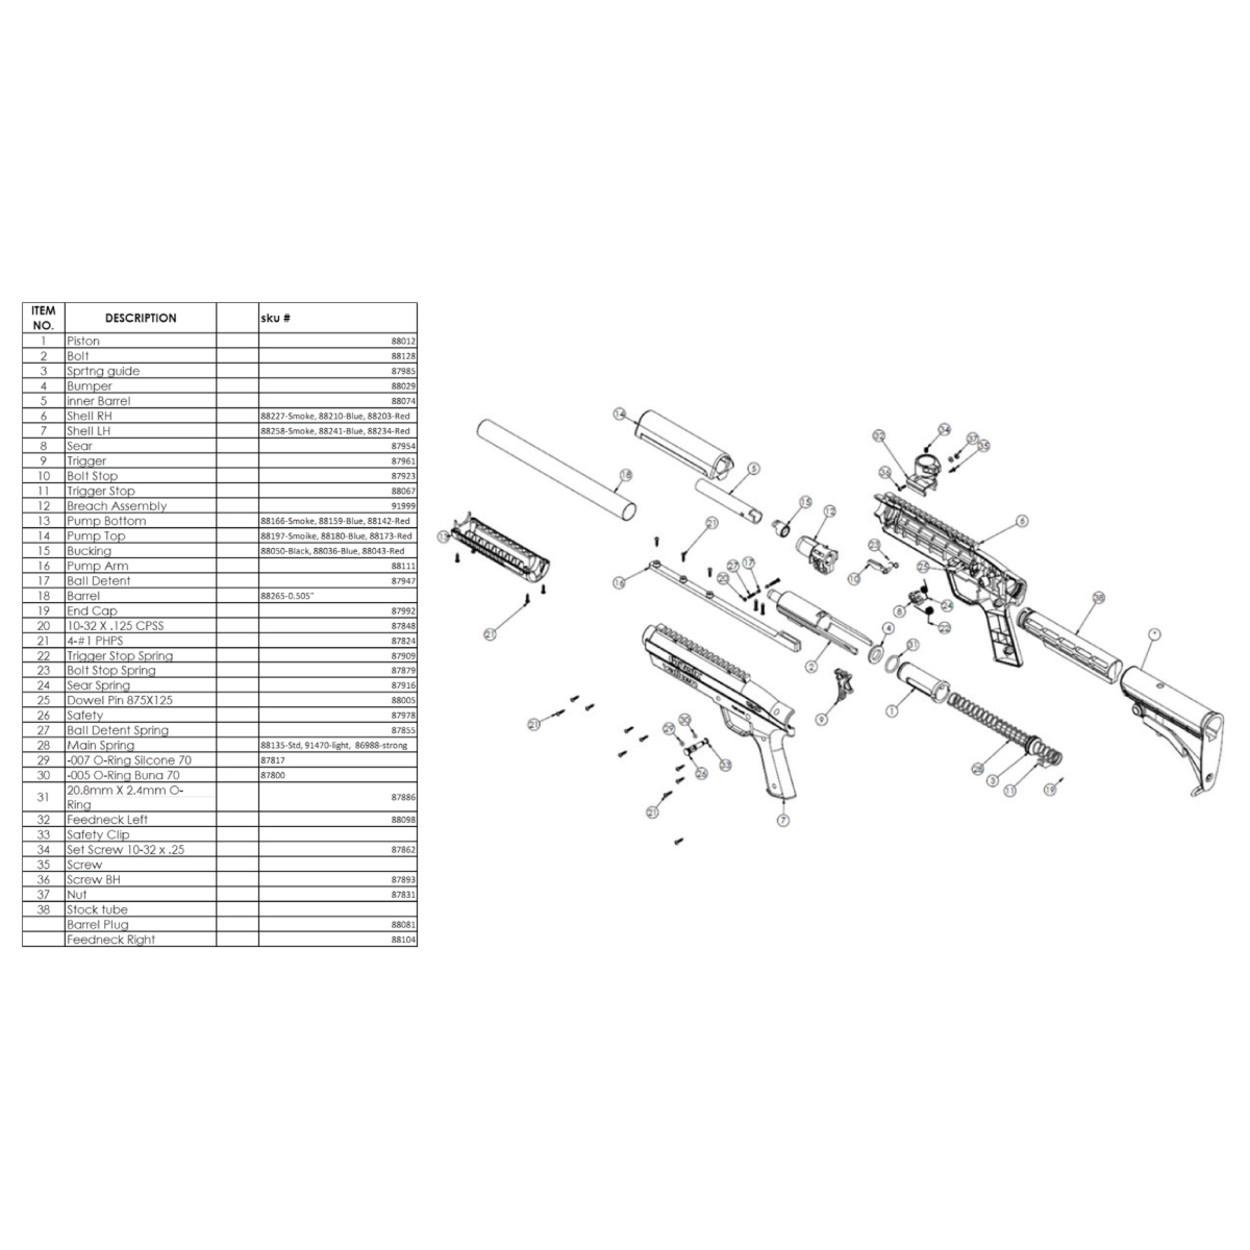 Valken Gotcha Paintball Kidz Shotgun - Pièces de rechange diverses